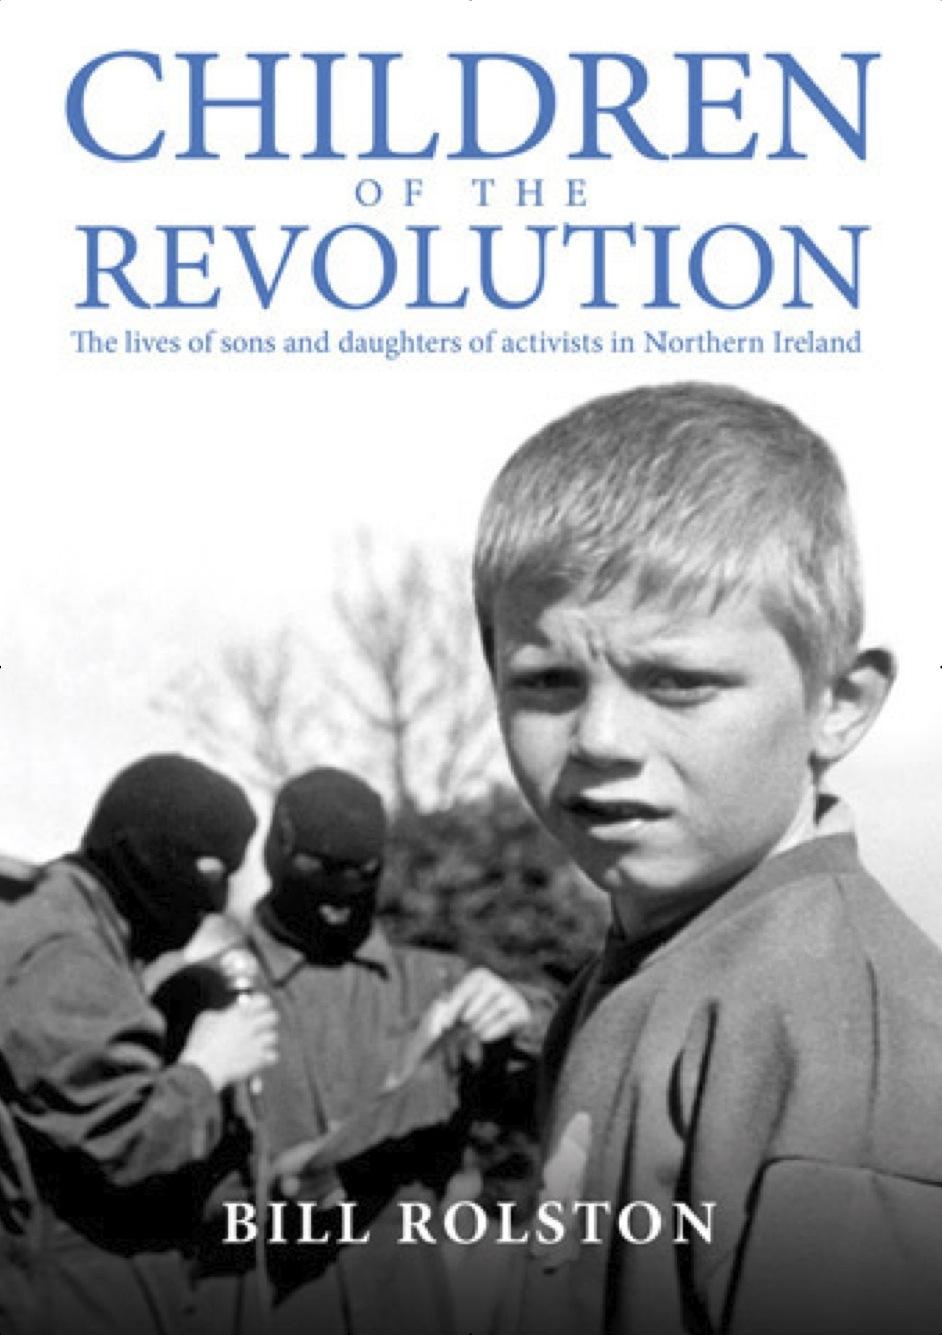 Children of the Revolution by Bill Rolston